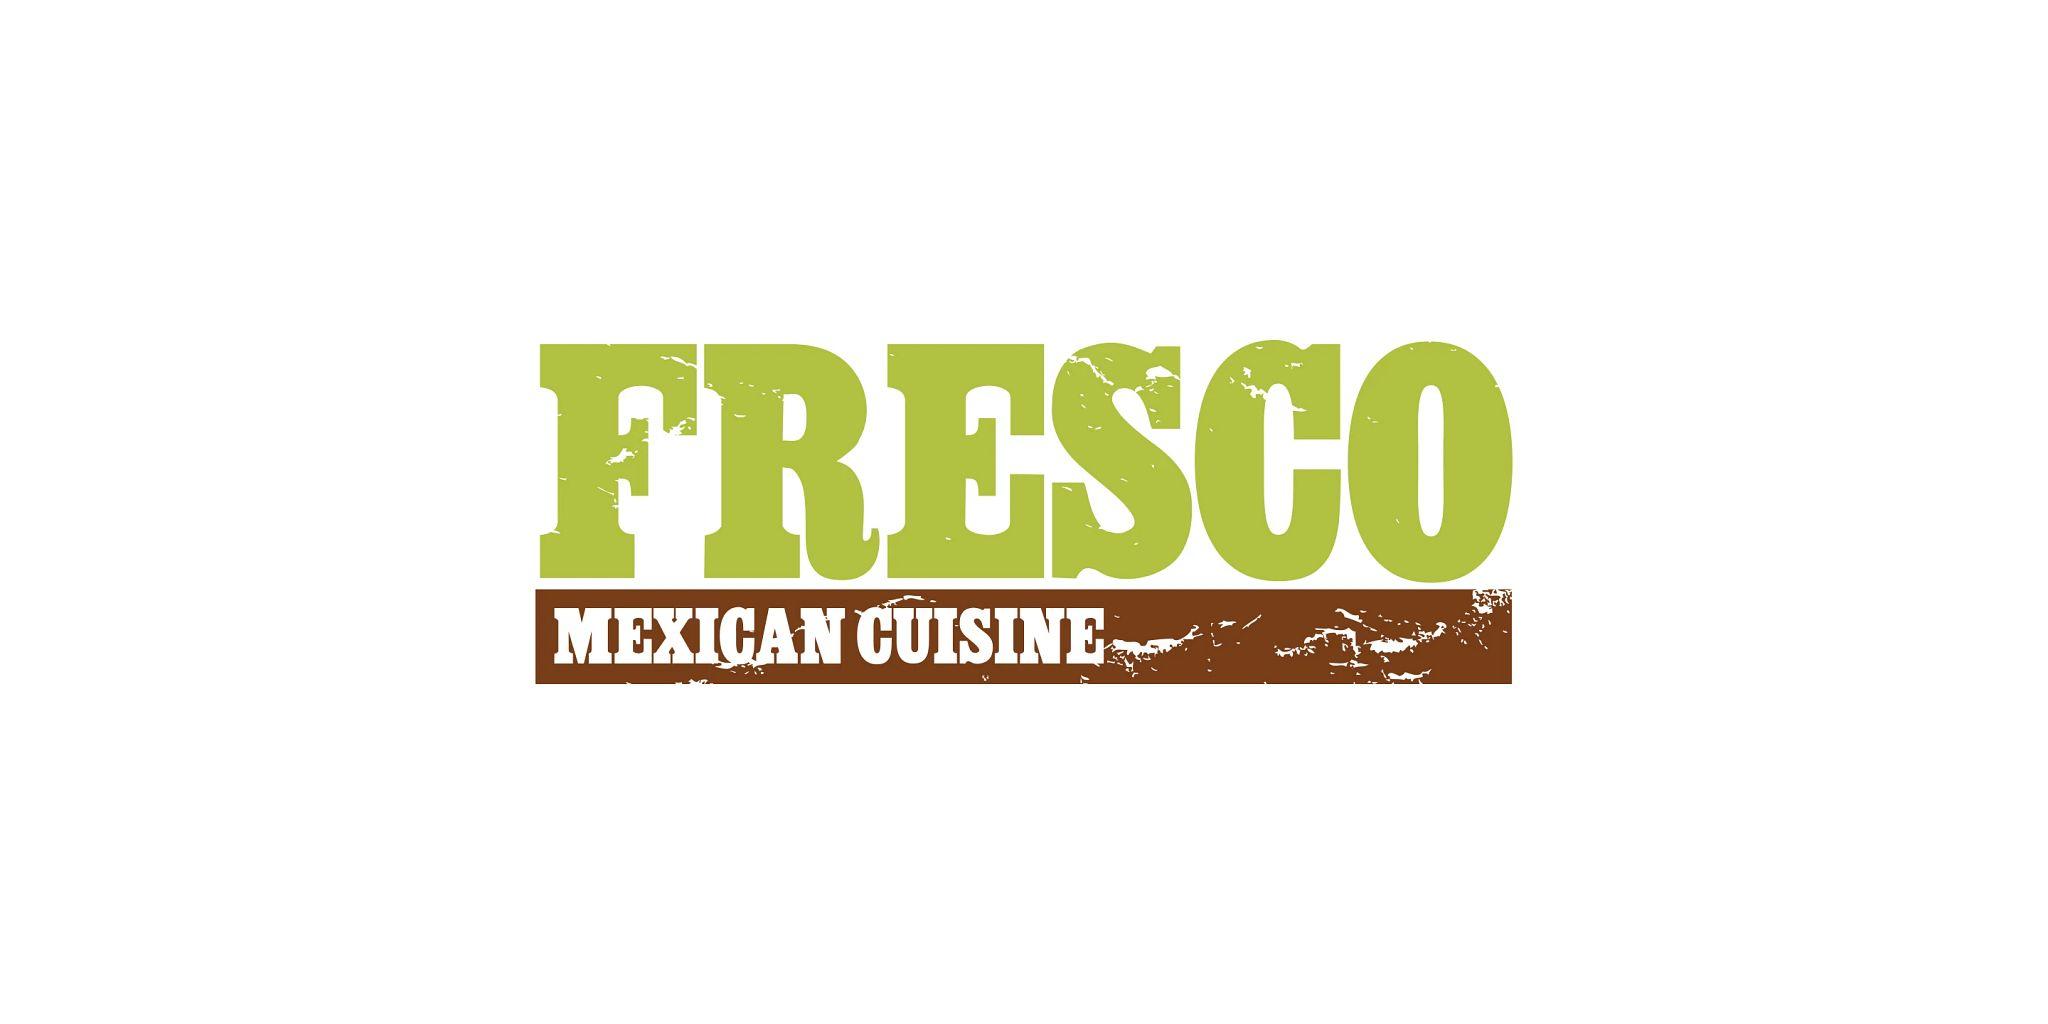 Fresco Mexican Cuisine